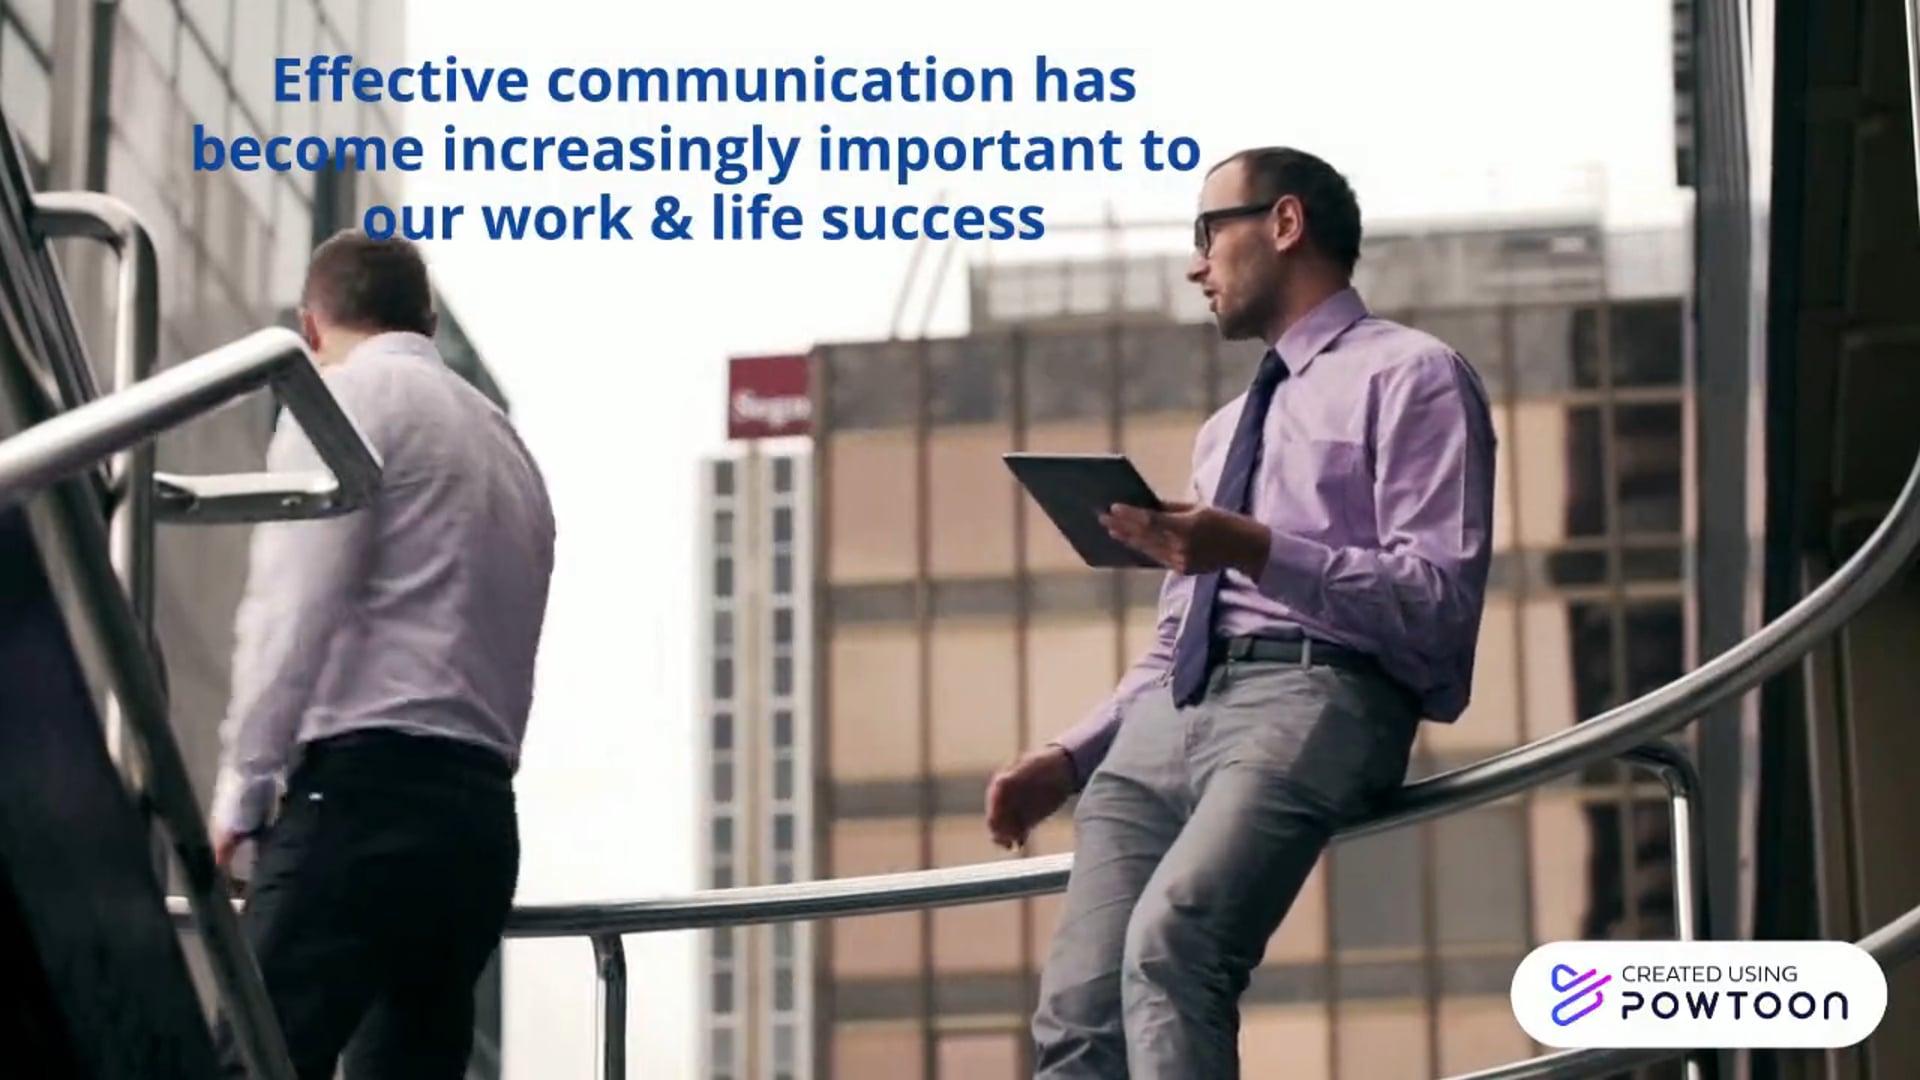 Work life balance challenges